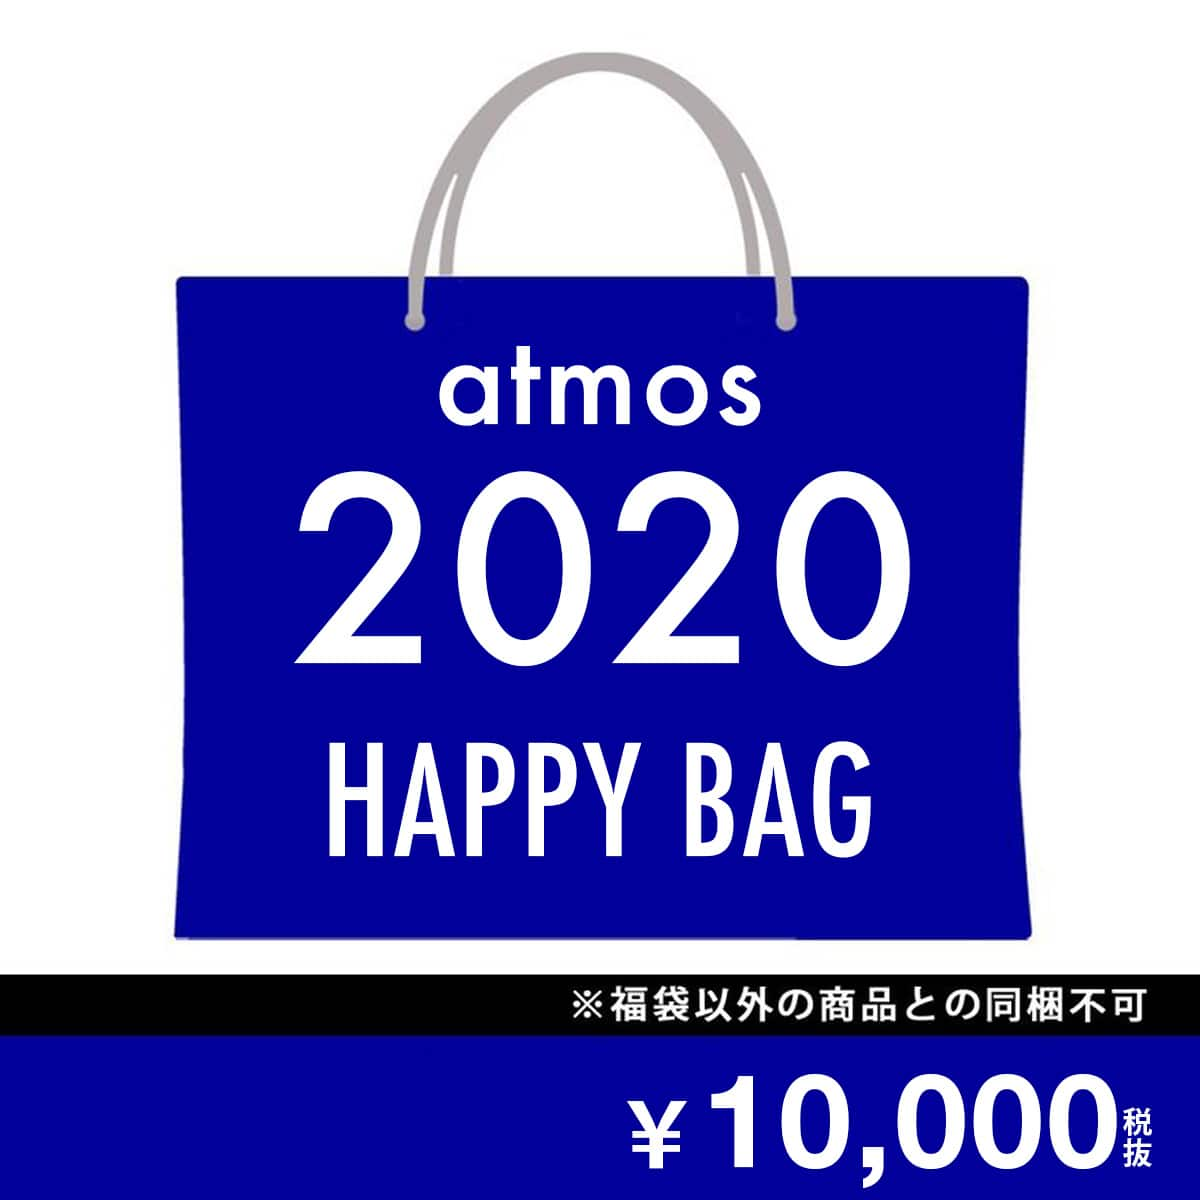 atmos 【2020年福袋】 HAPPY BAG 一万円 (MENS) 20SP-S_photo_large